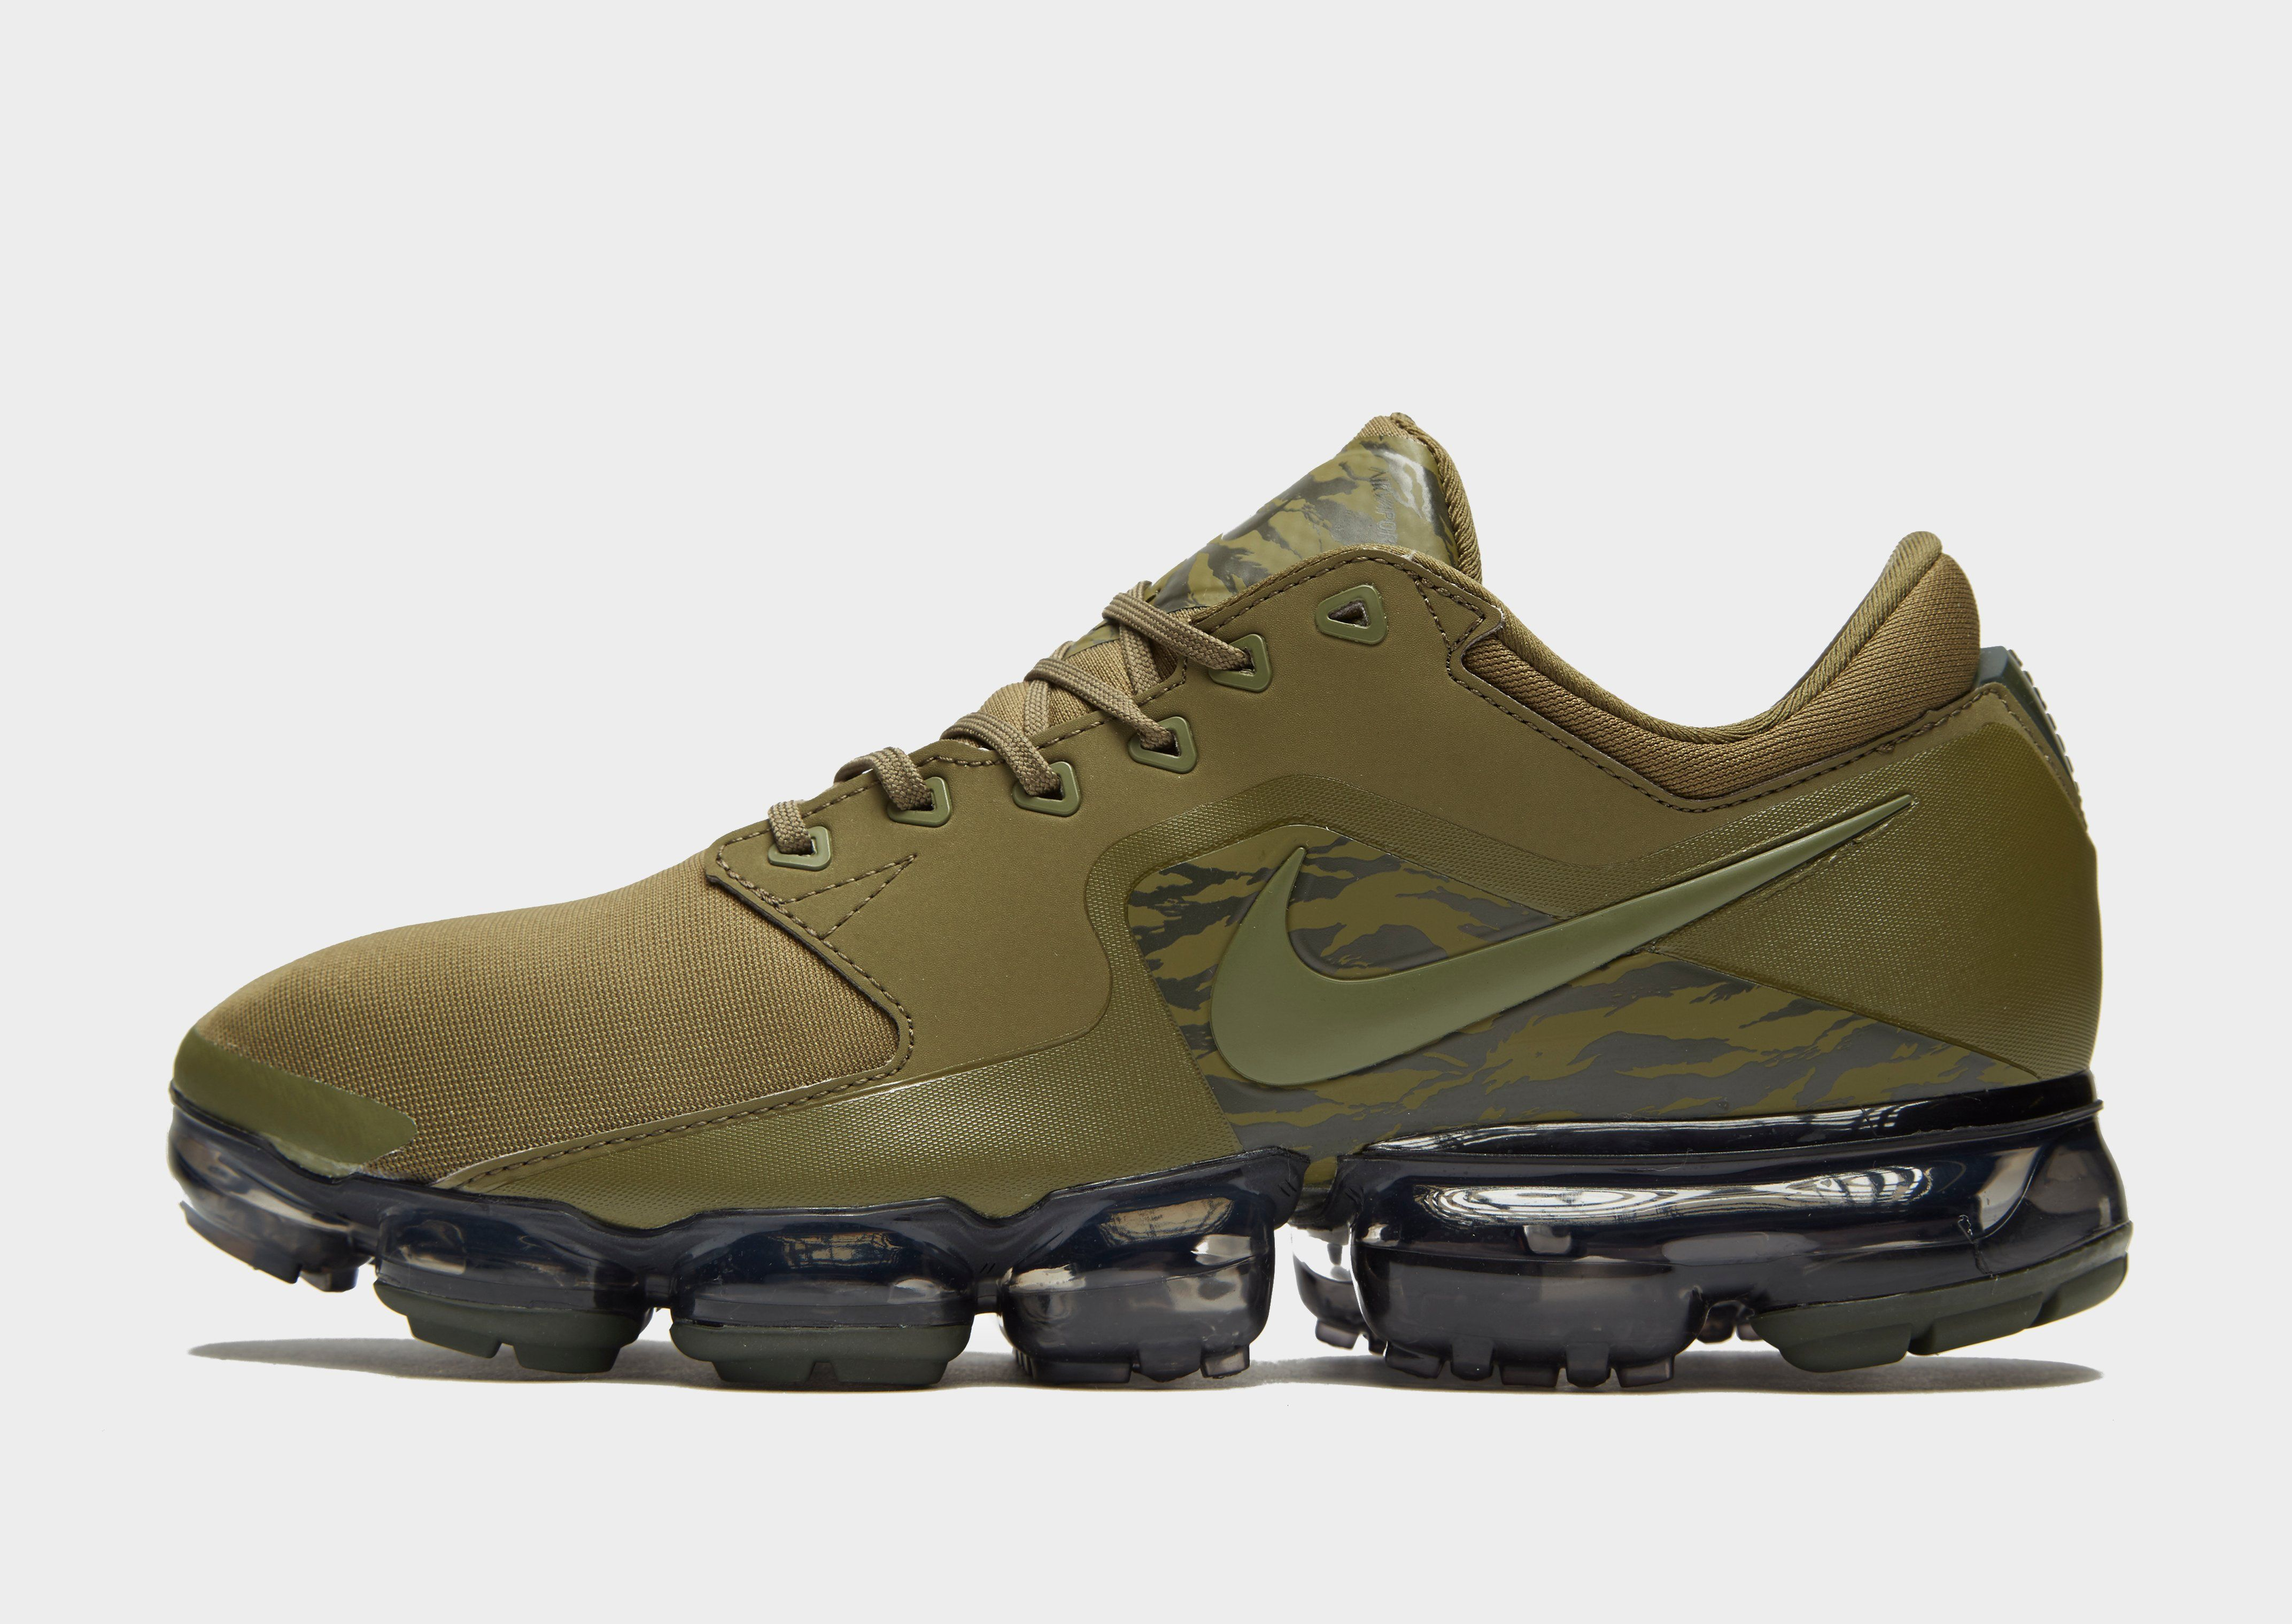 847f55a8f96805 Nike Air VaporMax